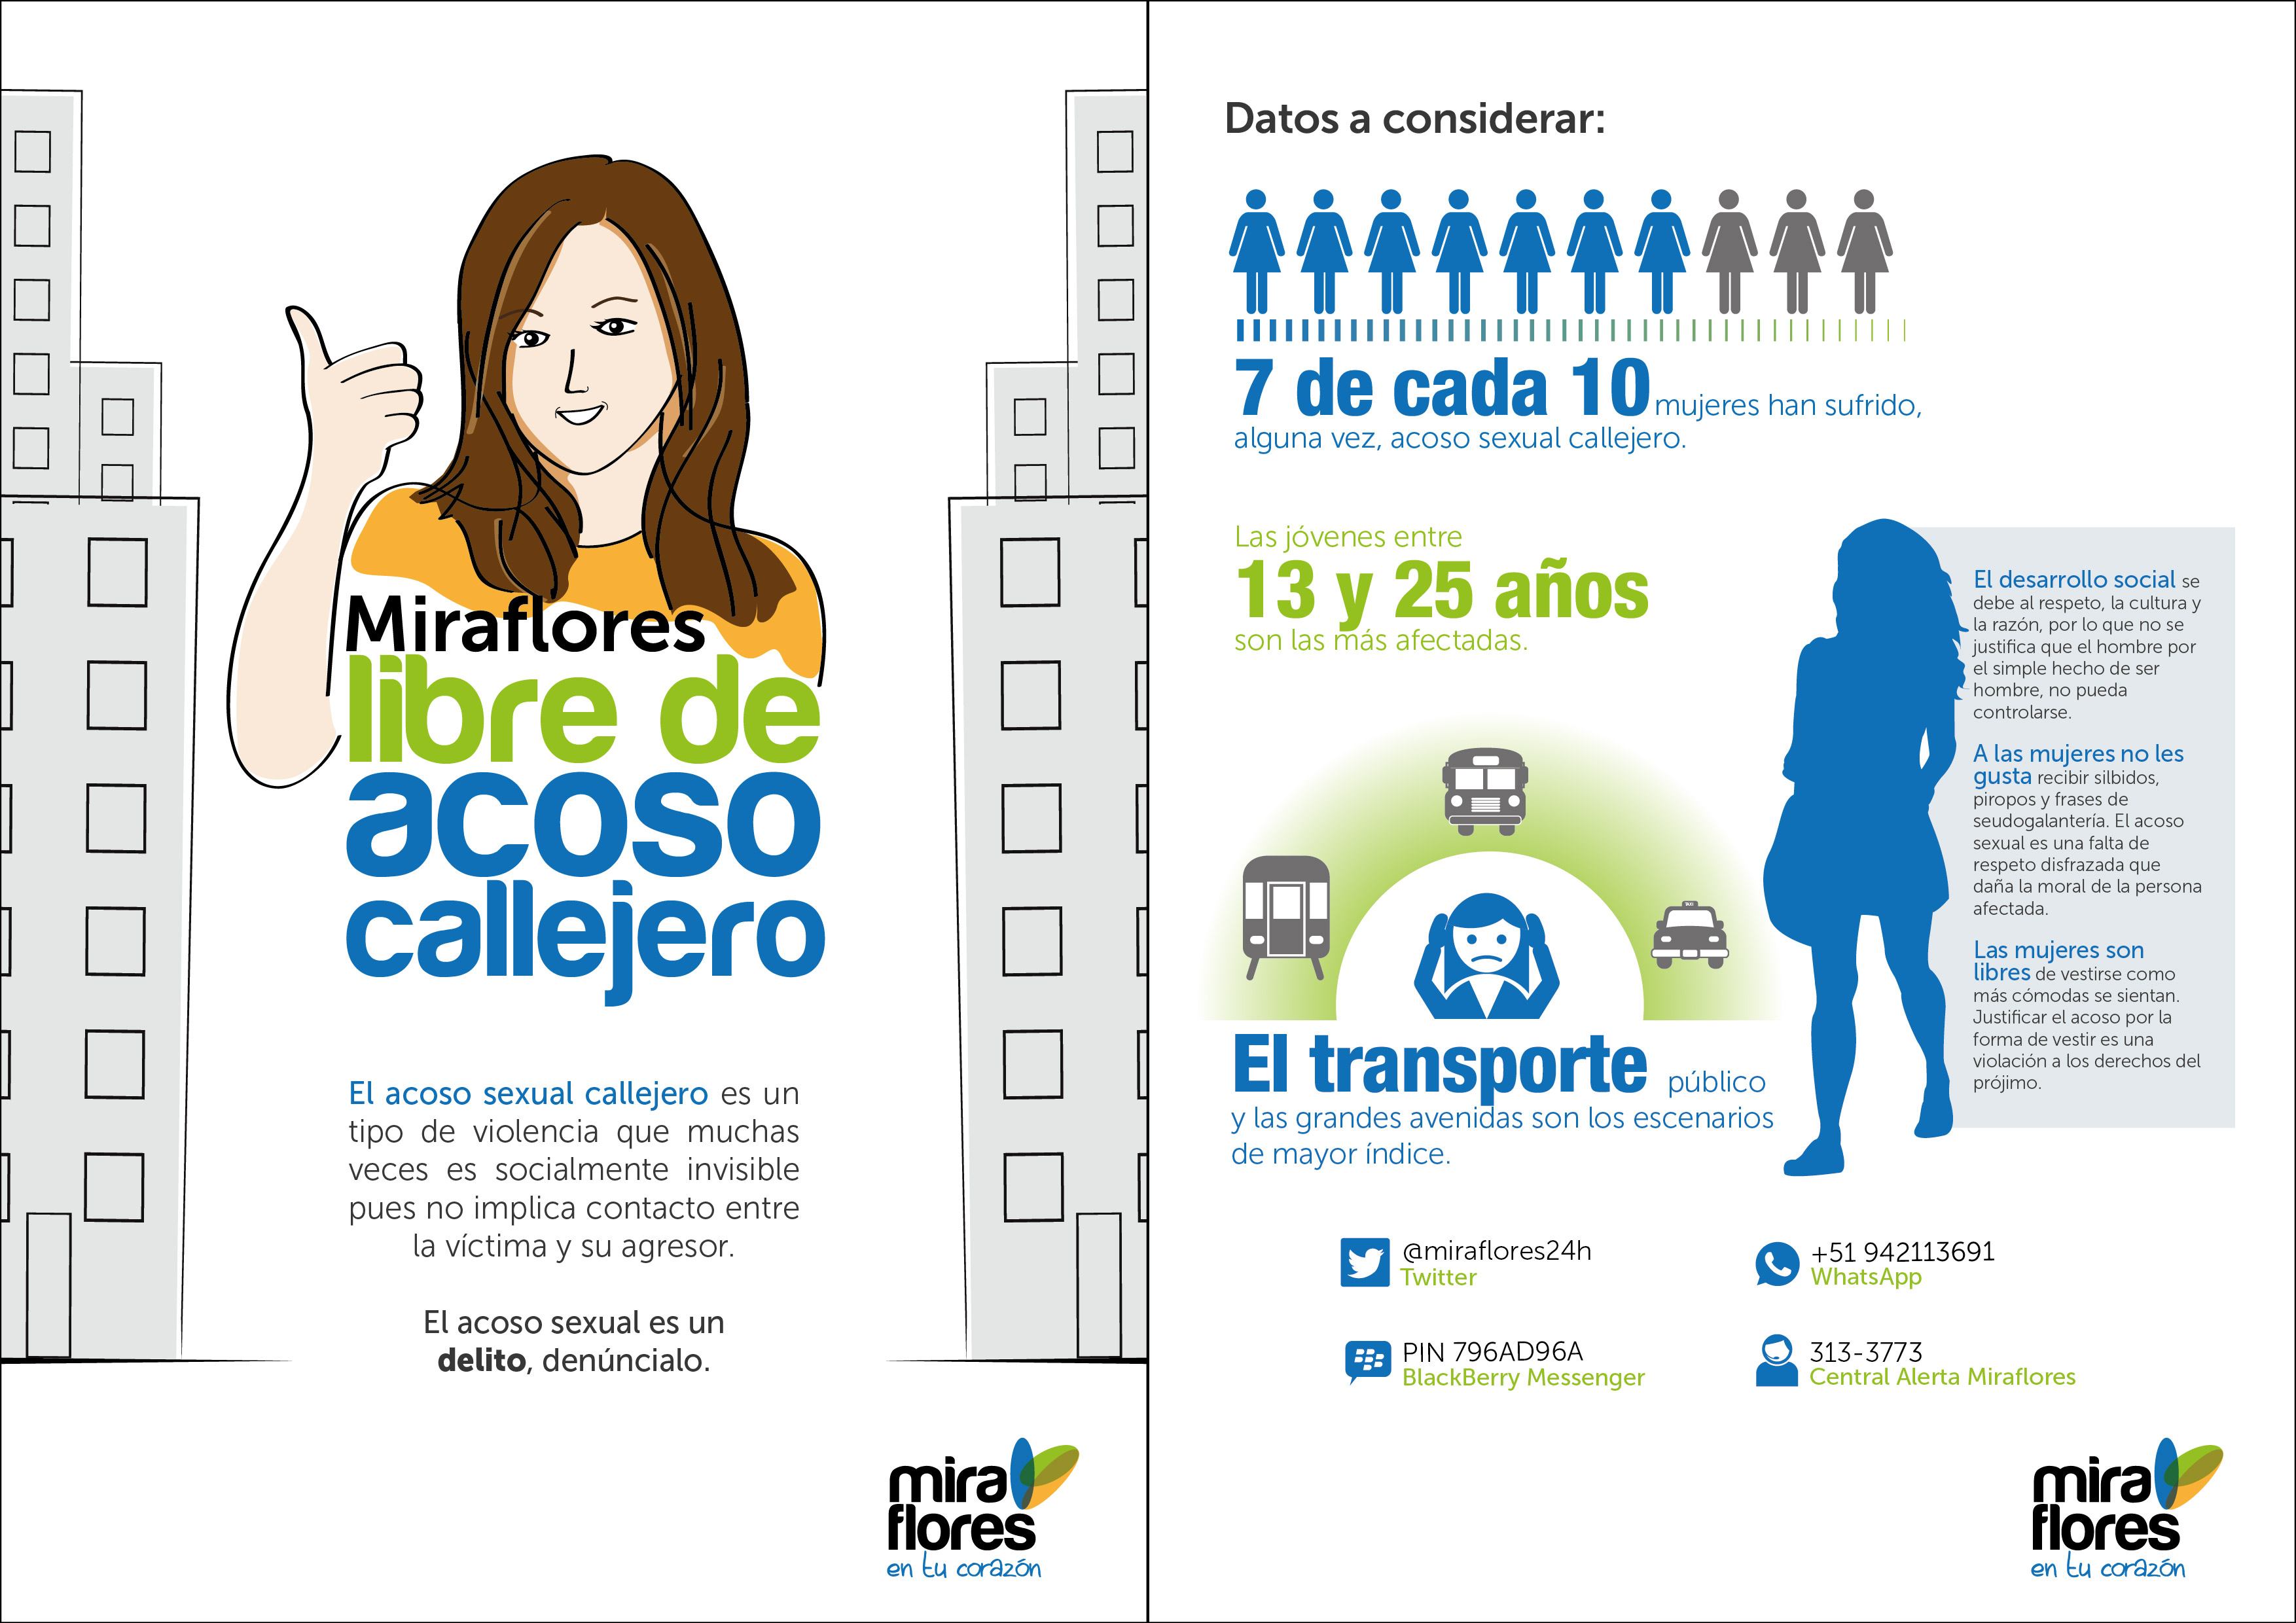 http://www.miraflores.gob.pe/Gestorw3b/files/img/8102-16360-acoso_volante-01.jpg